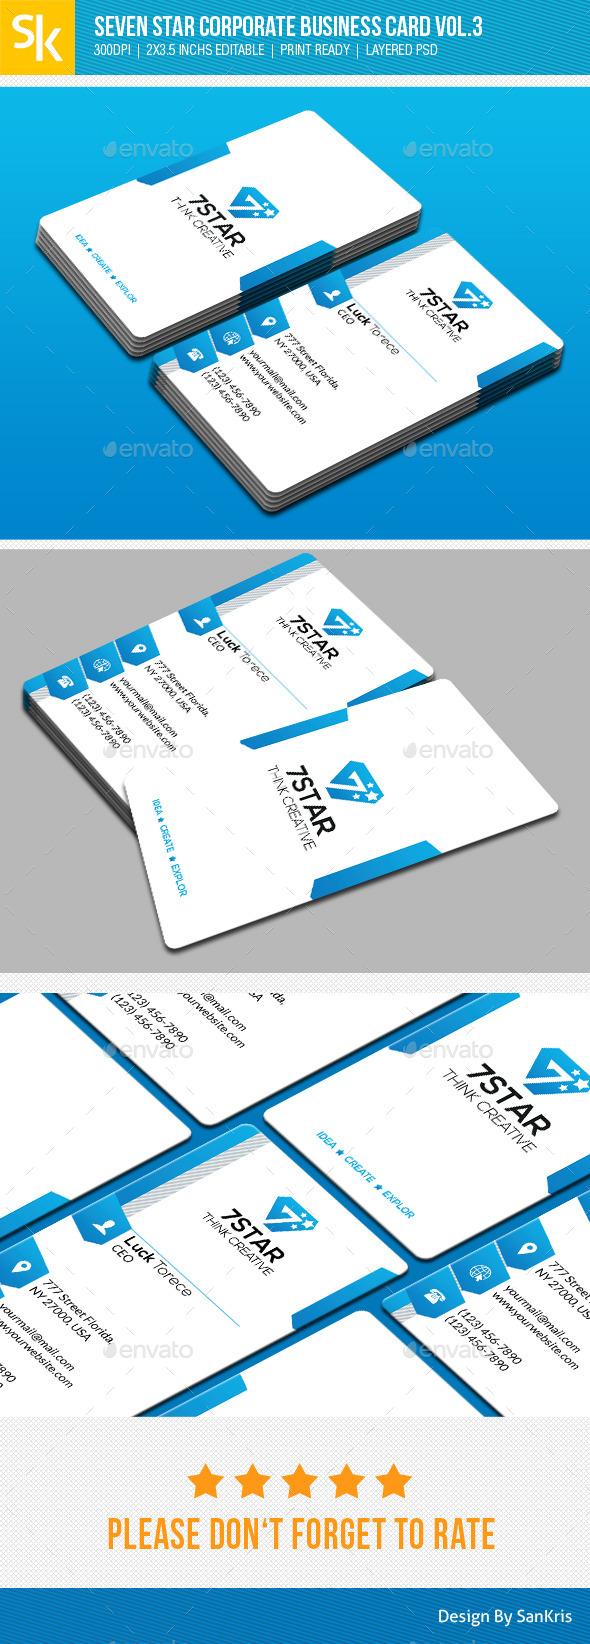 GraphicRiver Seven Star Corporate Business Card Vol.3 10870037